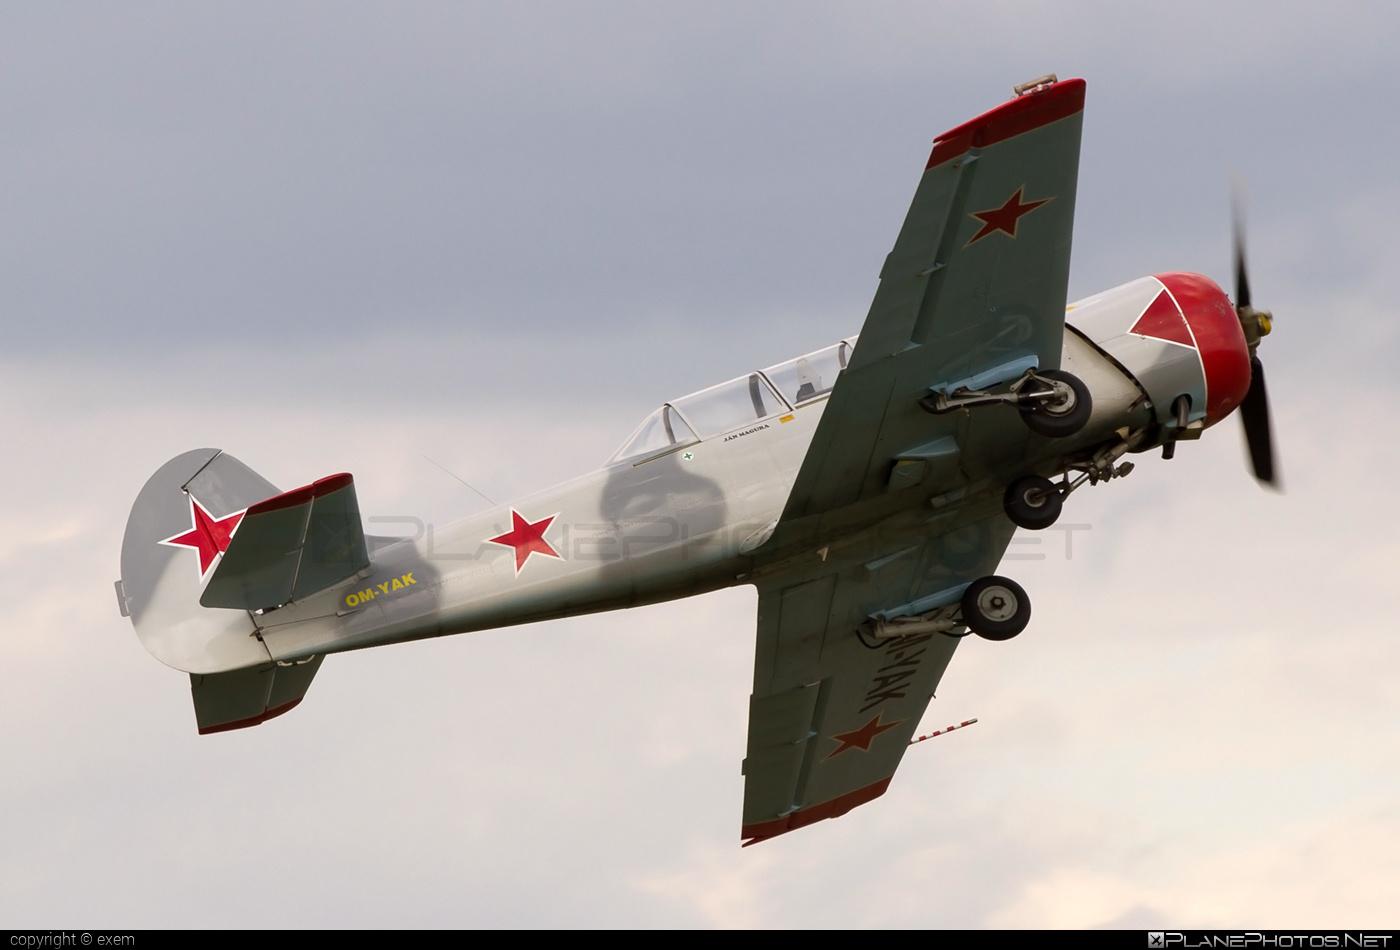 Yakovlev Yak-52 - OM-YAK operated by Aeroklub Košice #yak #yak52 #yakovlev